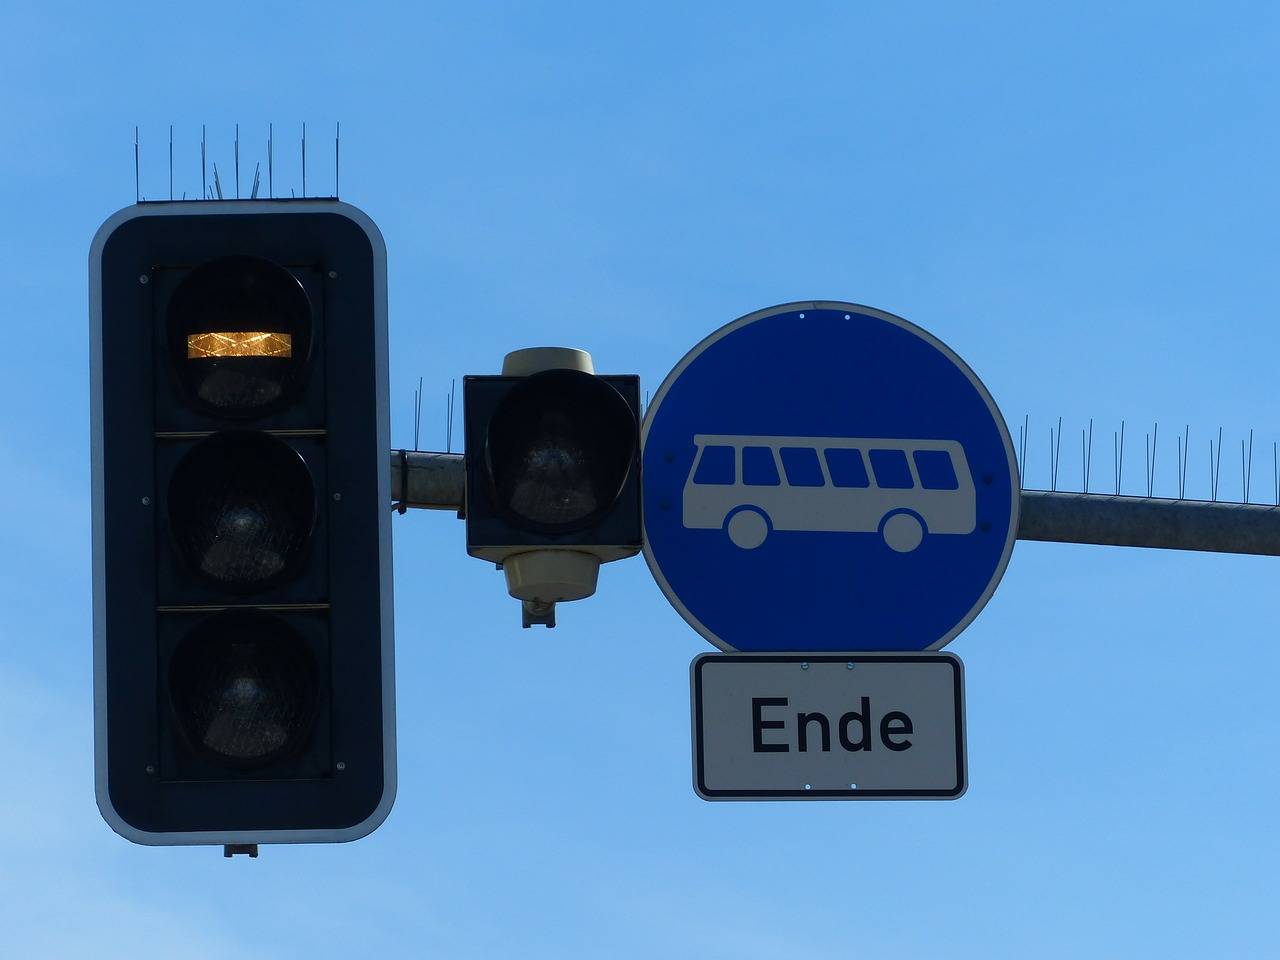 traffic-lights-99908_1280